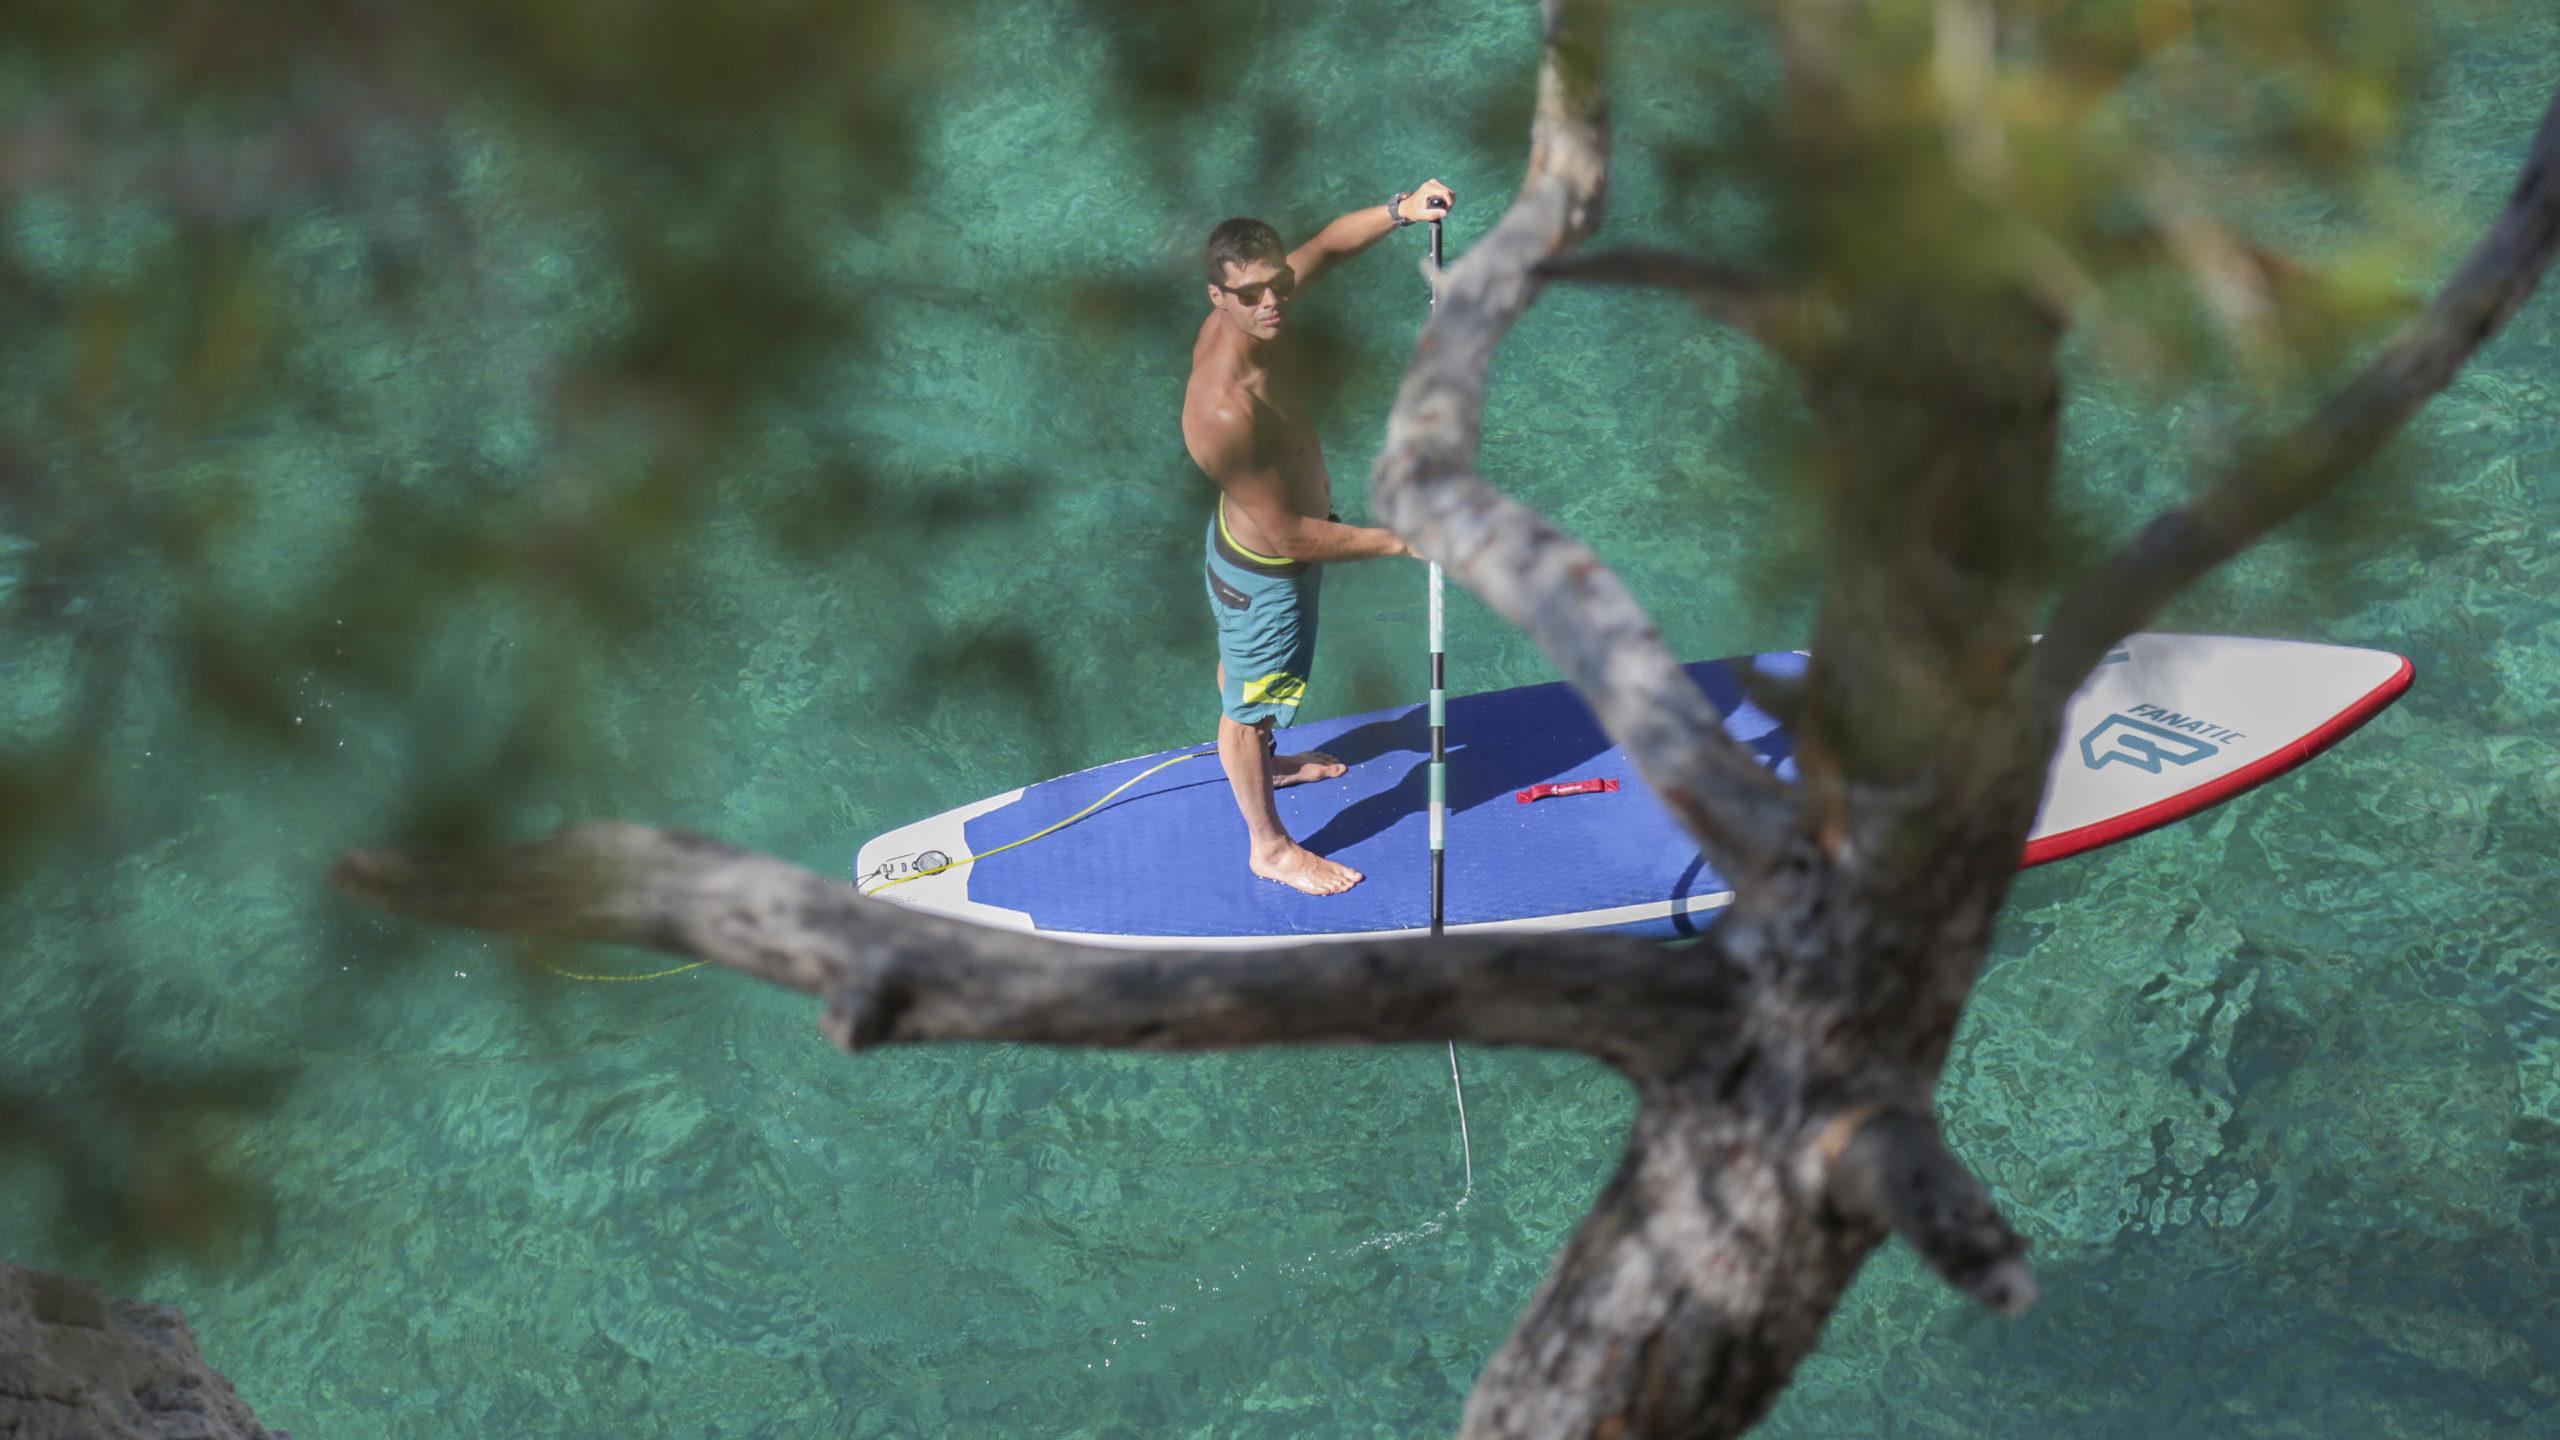 Randonnée Stand Up Paddle - H2o Paddle